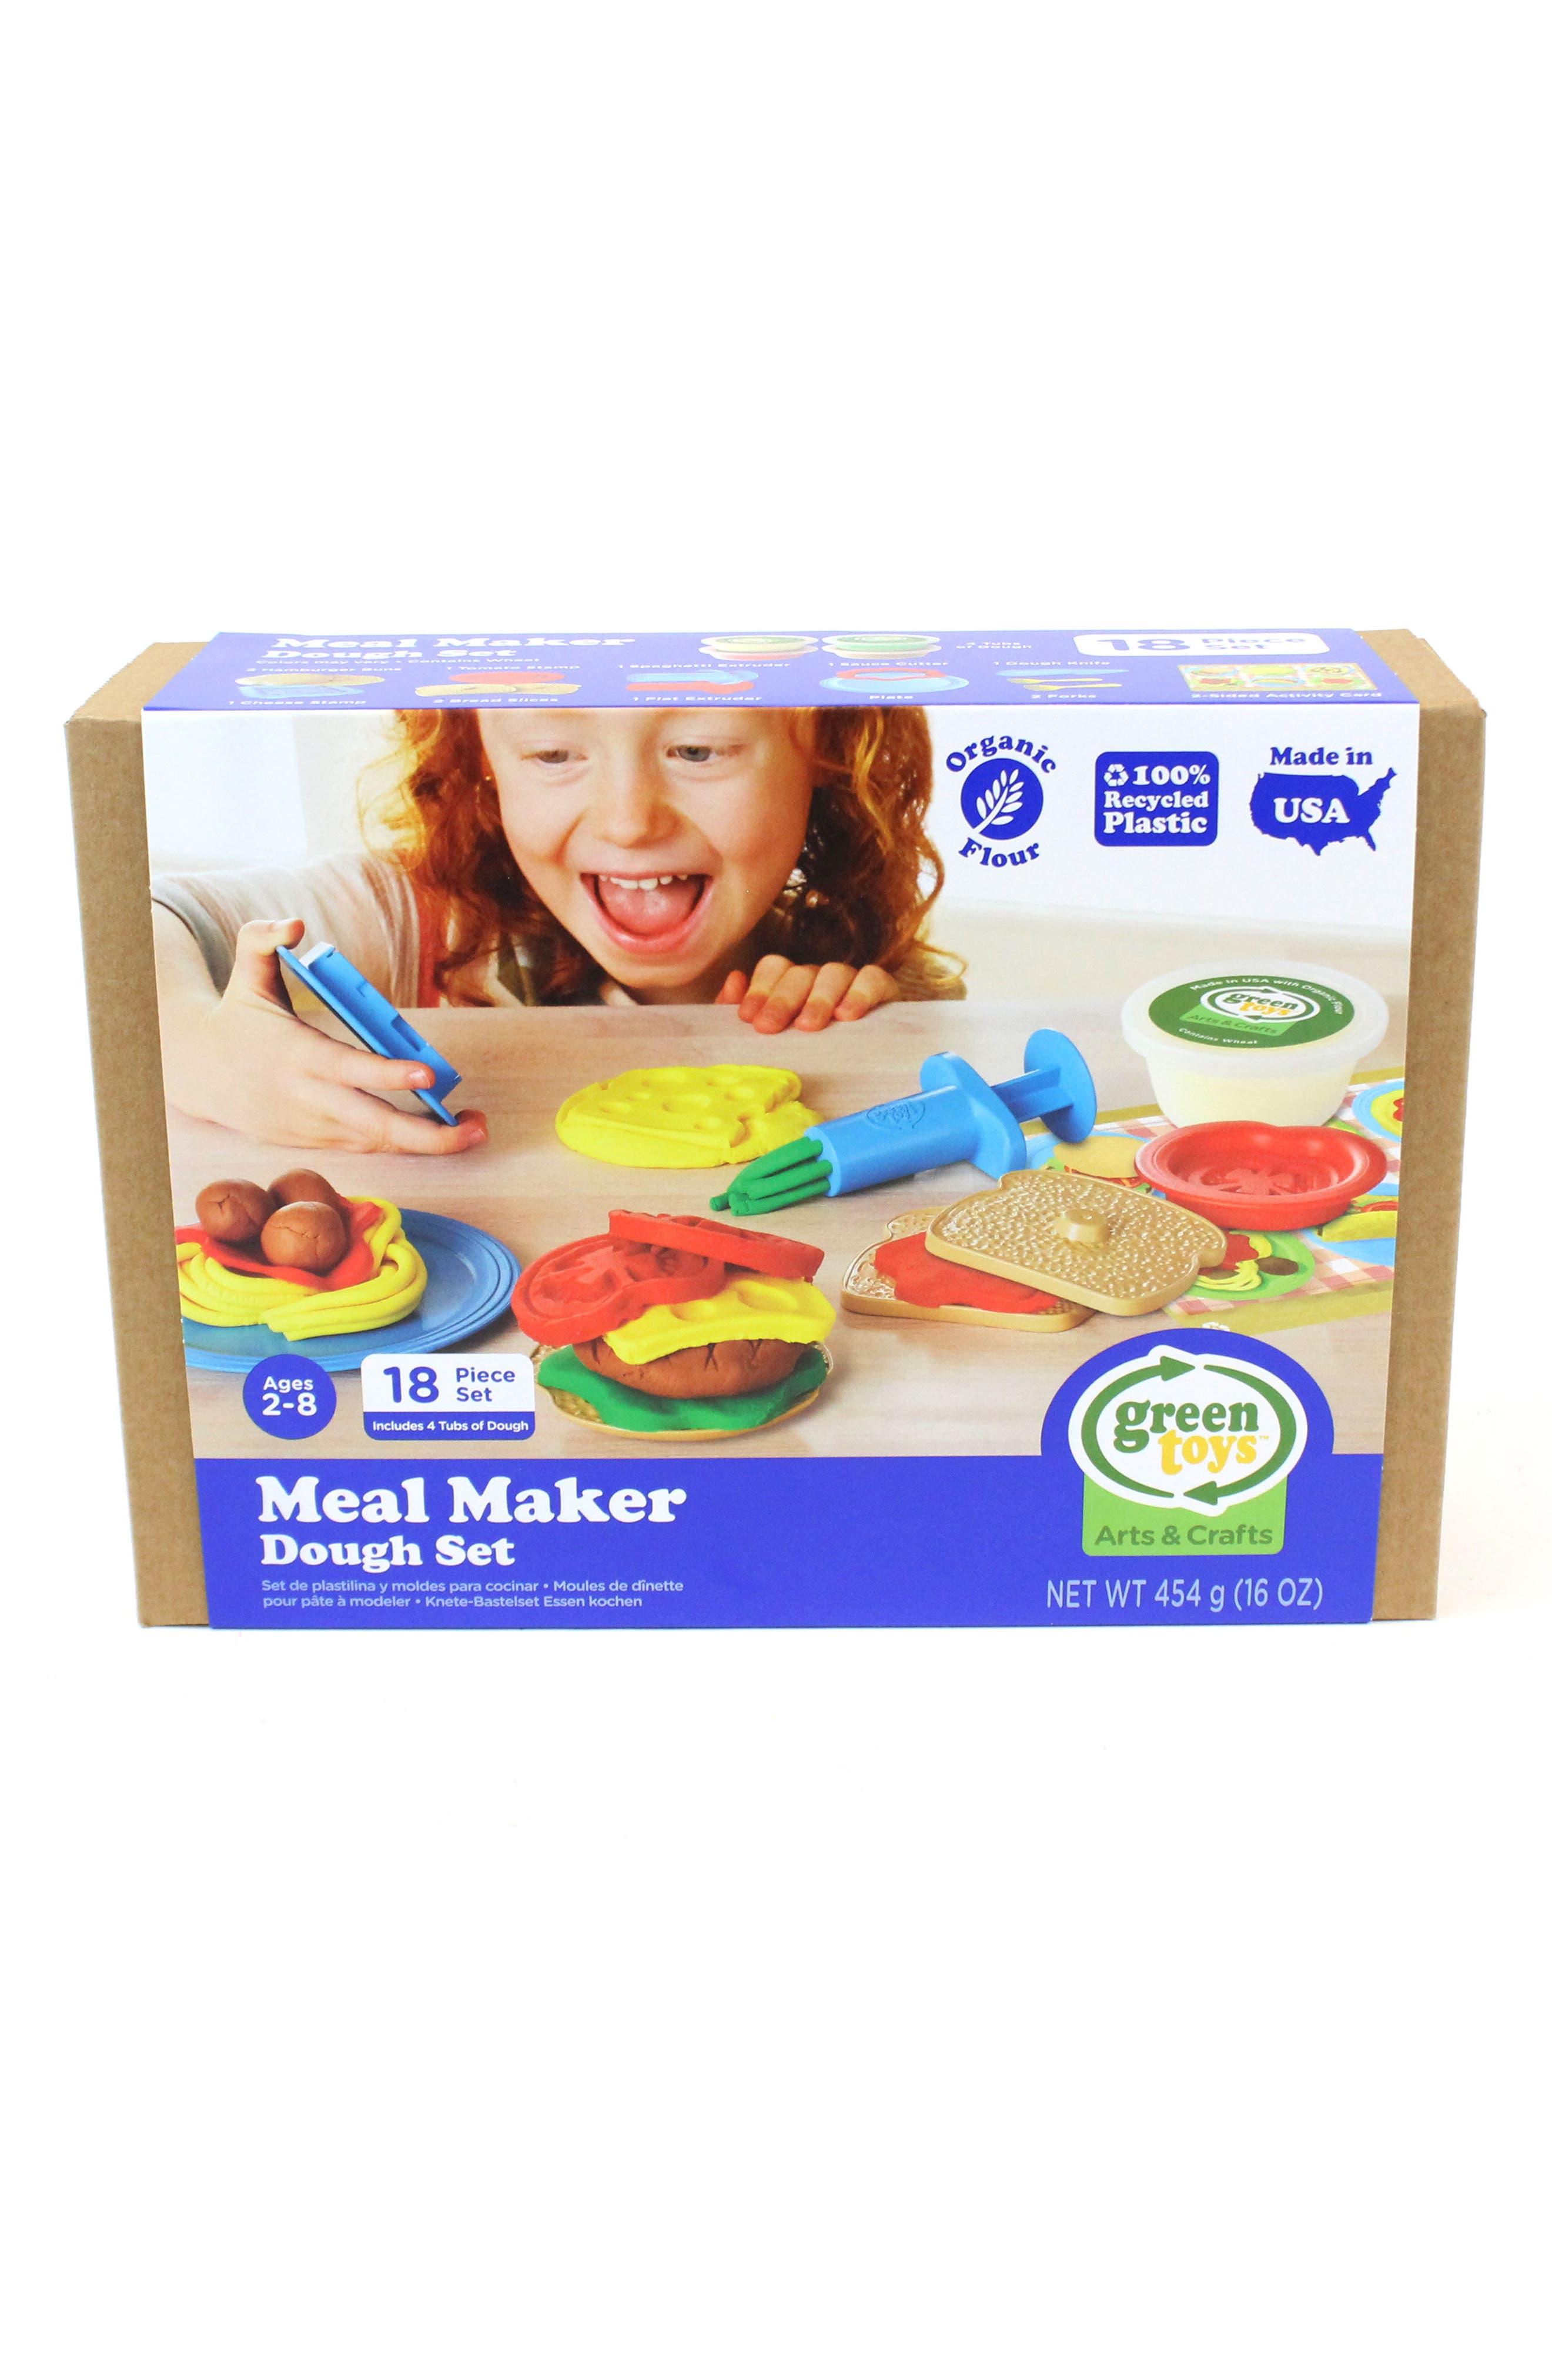 Green Toys 18-Piece Plastic Meal Maker Dough Set